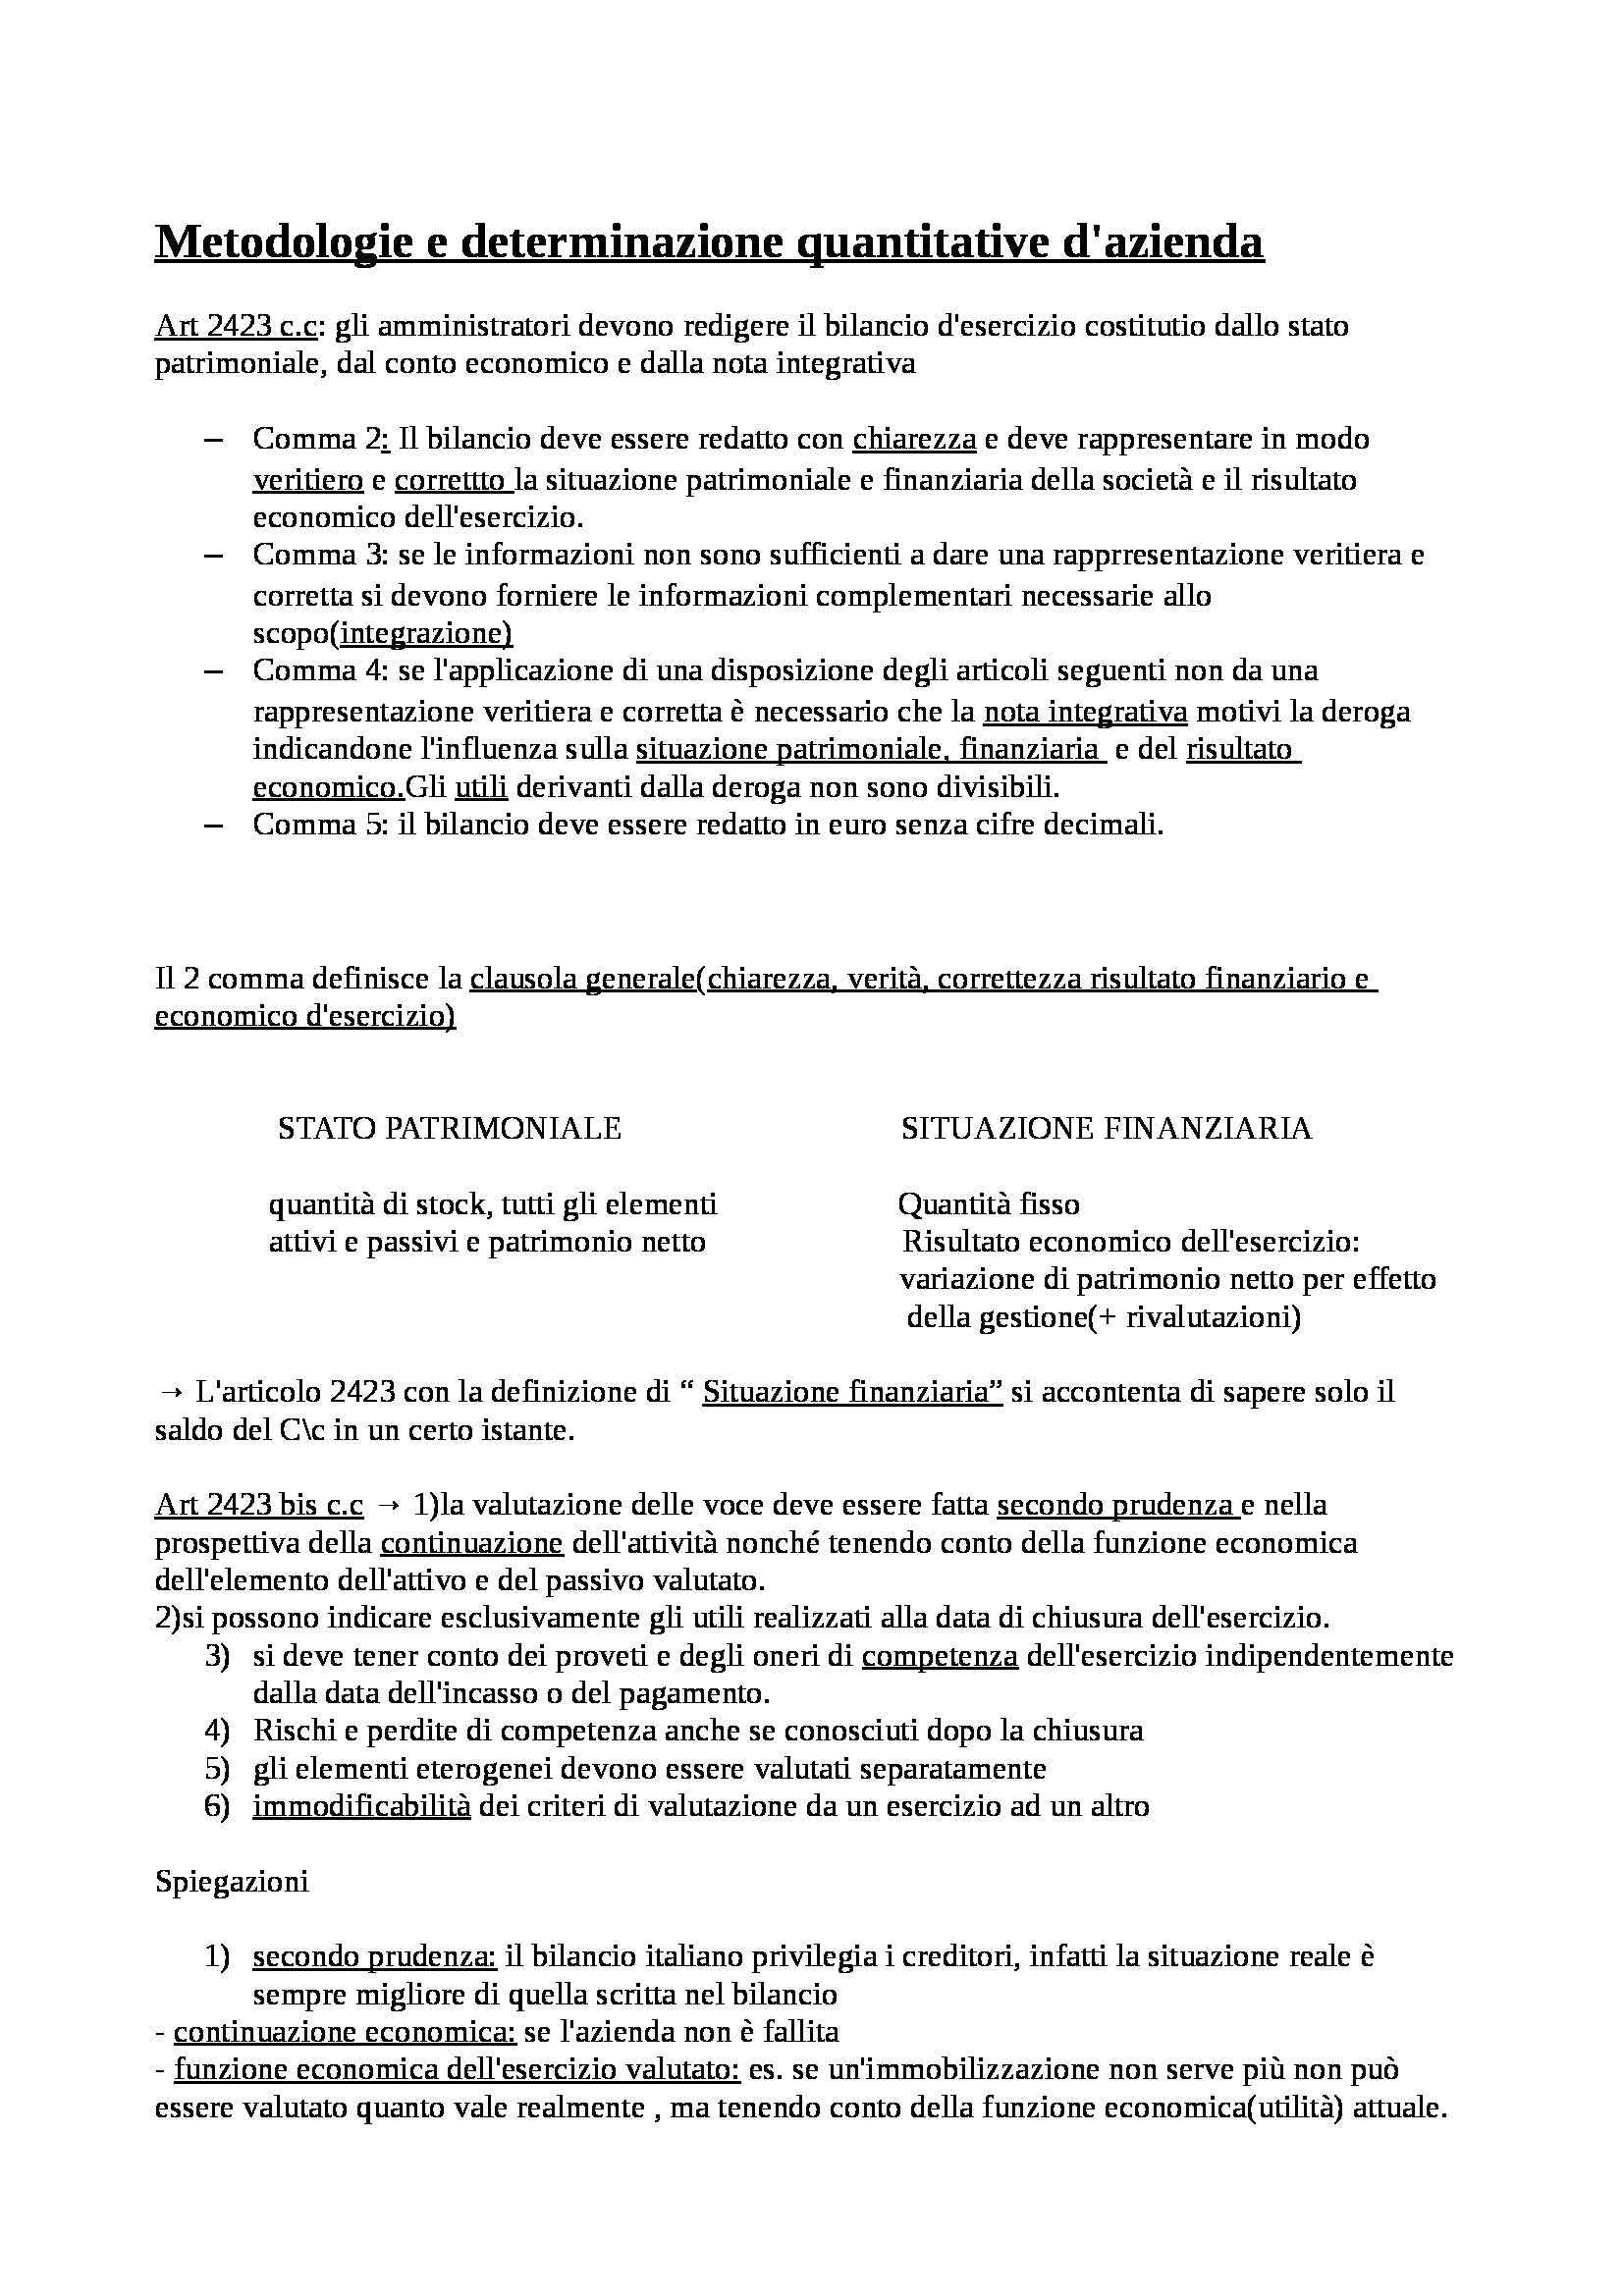 Metodologie e determinazioni quantitative d'azienda Golia Cattolica - Appunti